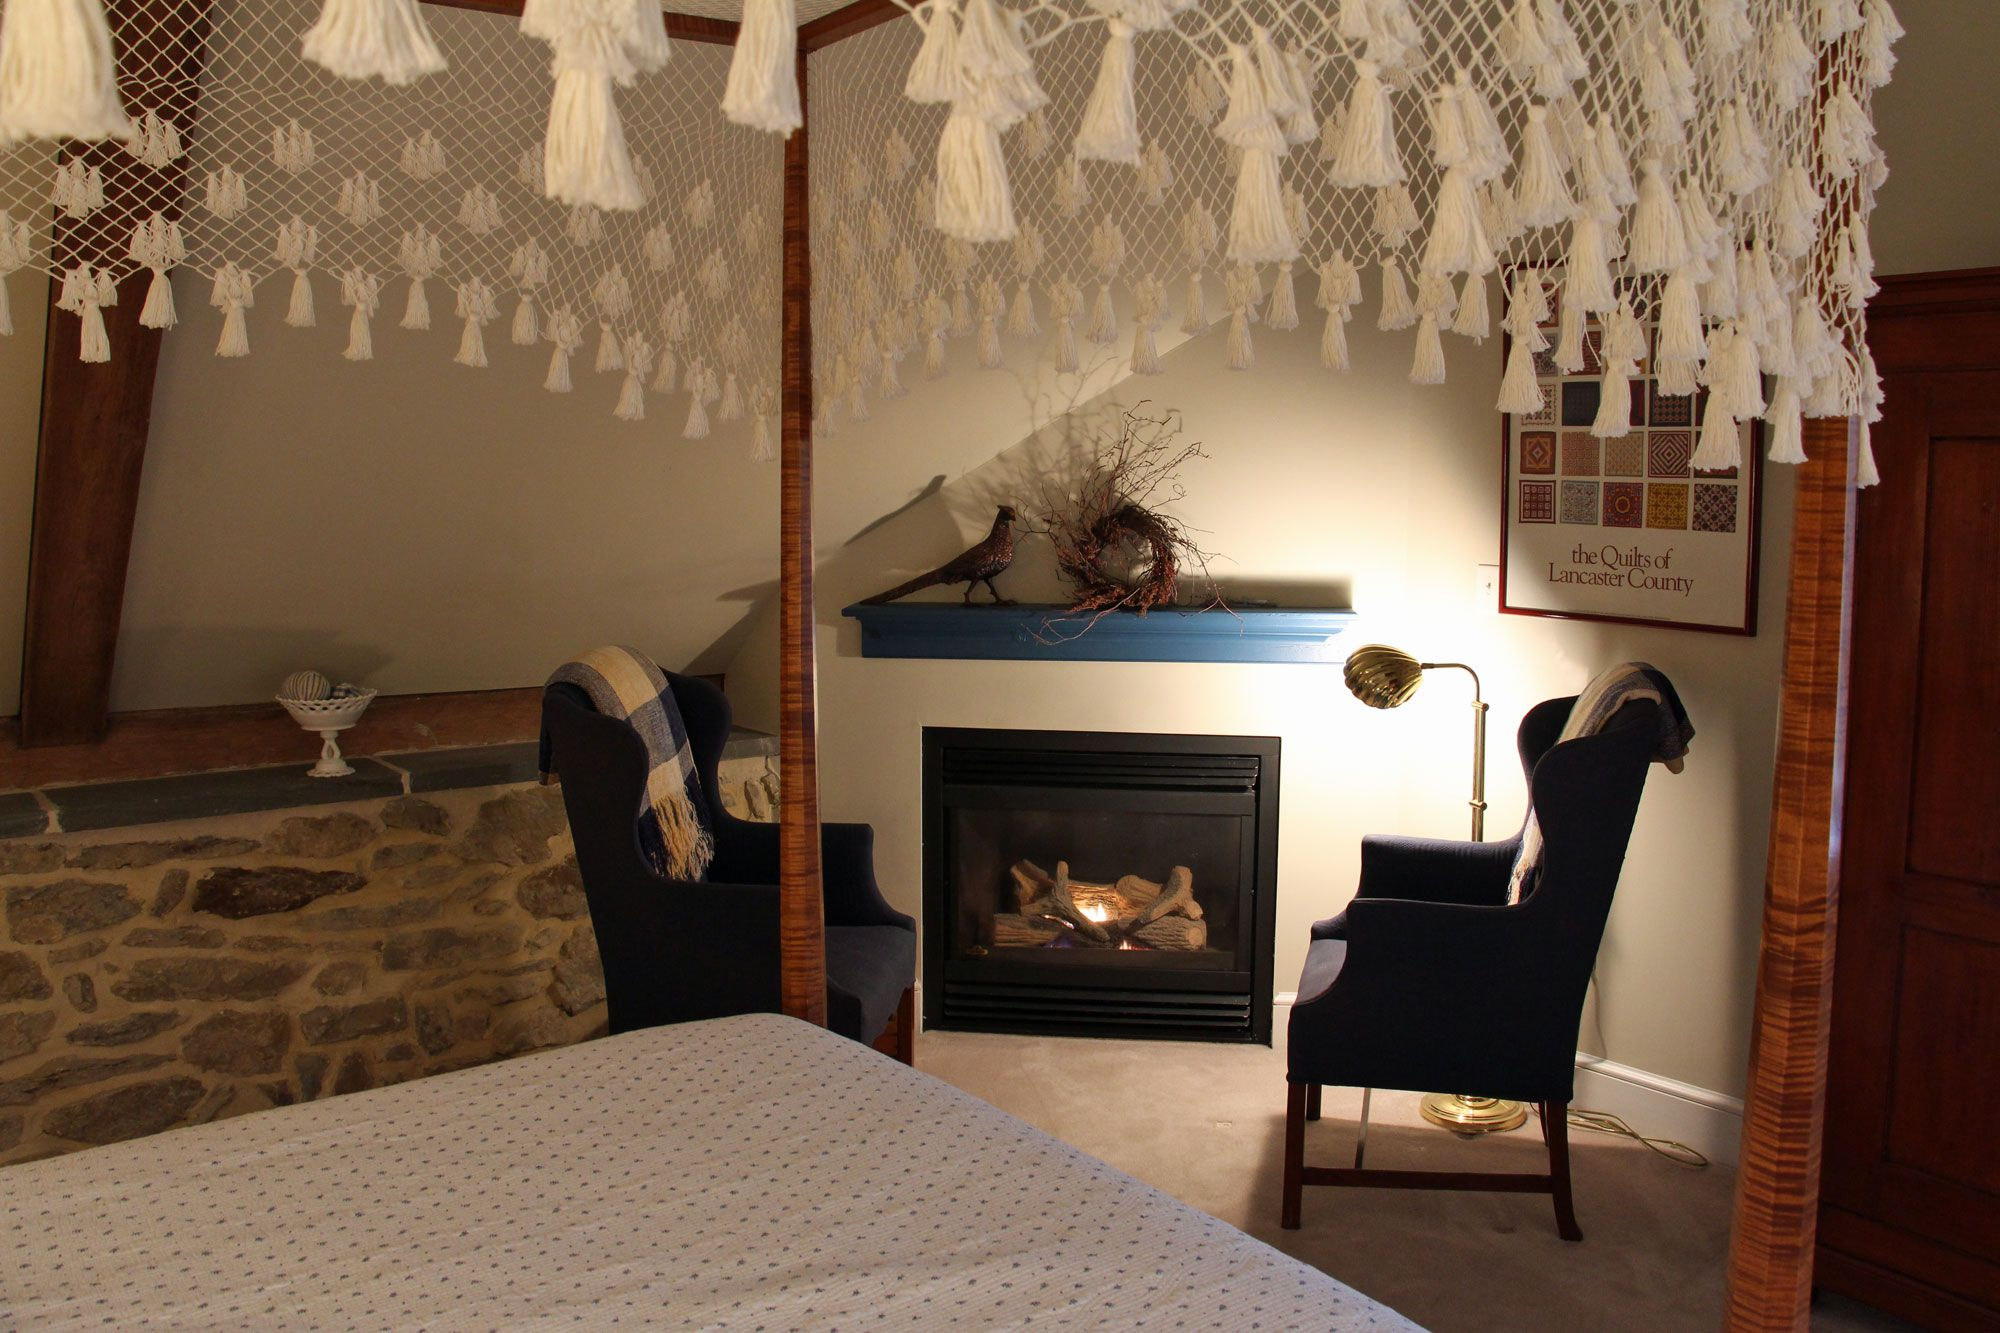 Cozy Interiors of Pheasant Run Farm Bed & Breakfast Bed